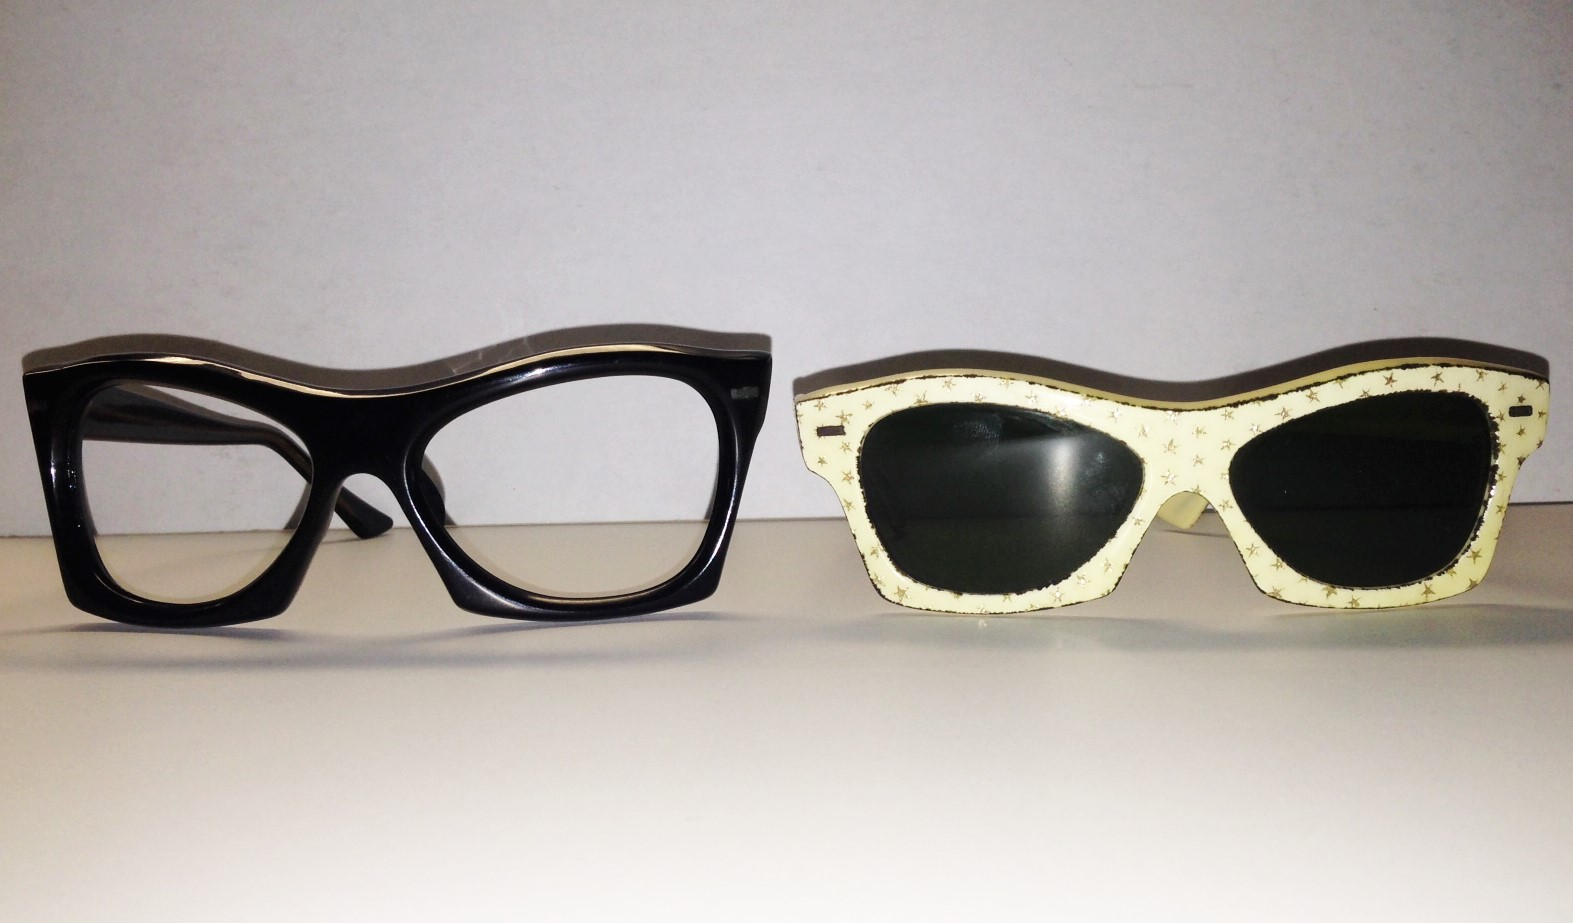 9874a7c9ea22 Faosa eyewear jose esquivel buddy holly eyeglasses archives JPG 1573x923 Buddy  holly eyeglass frames